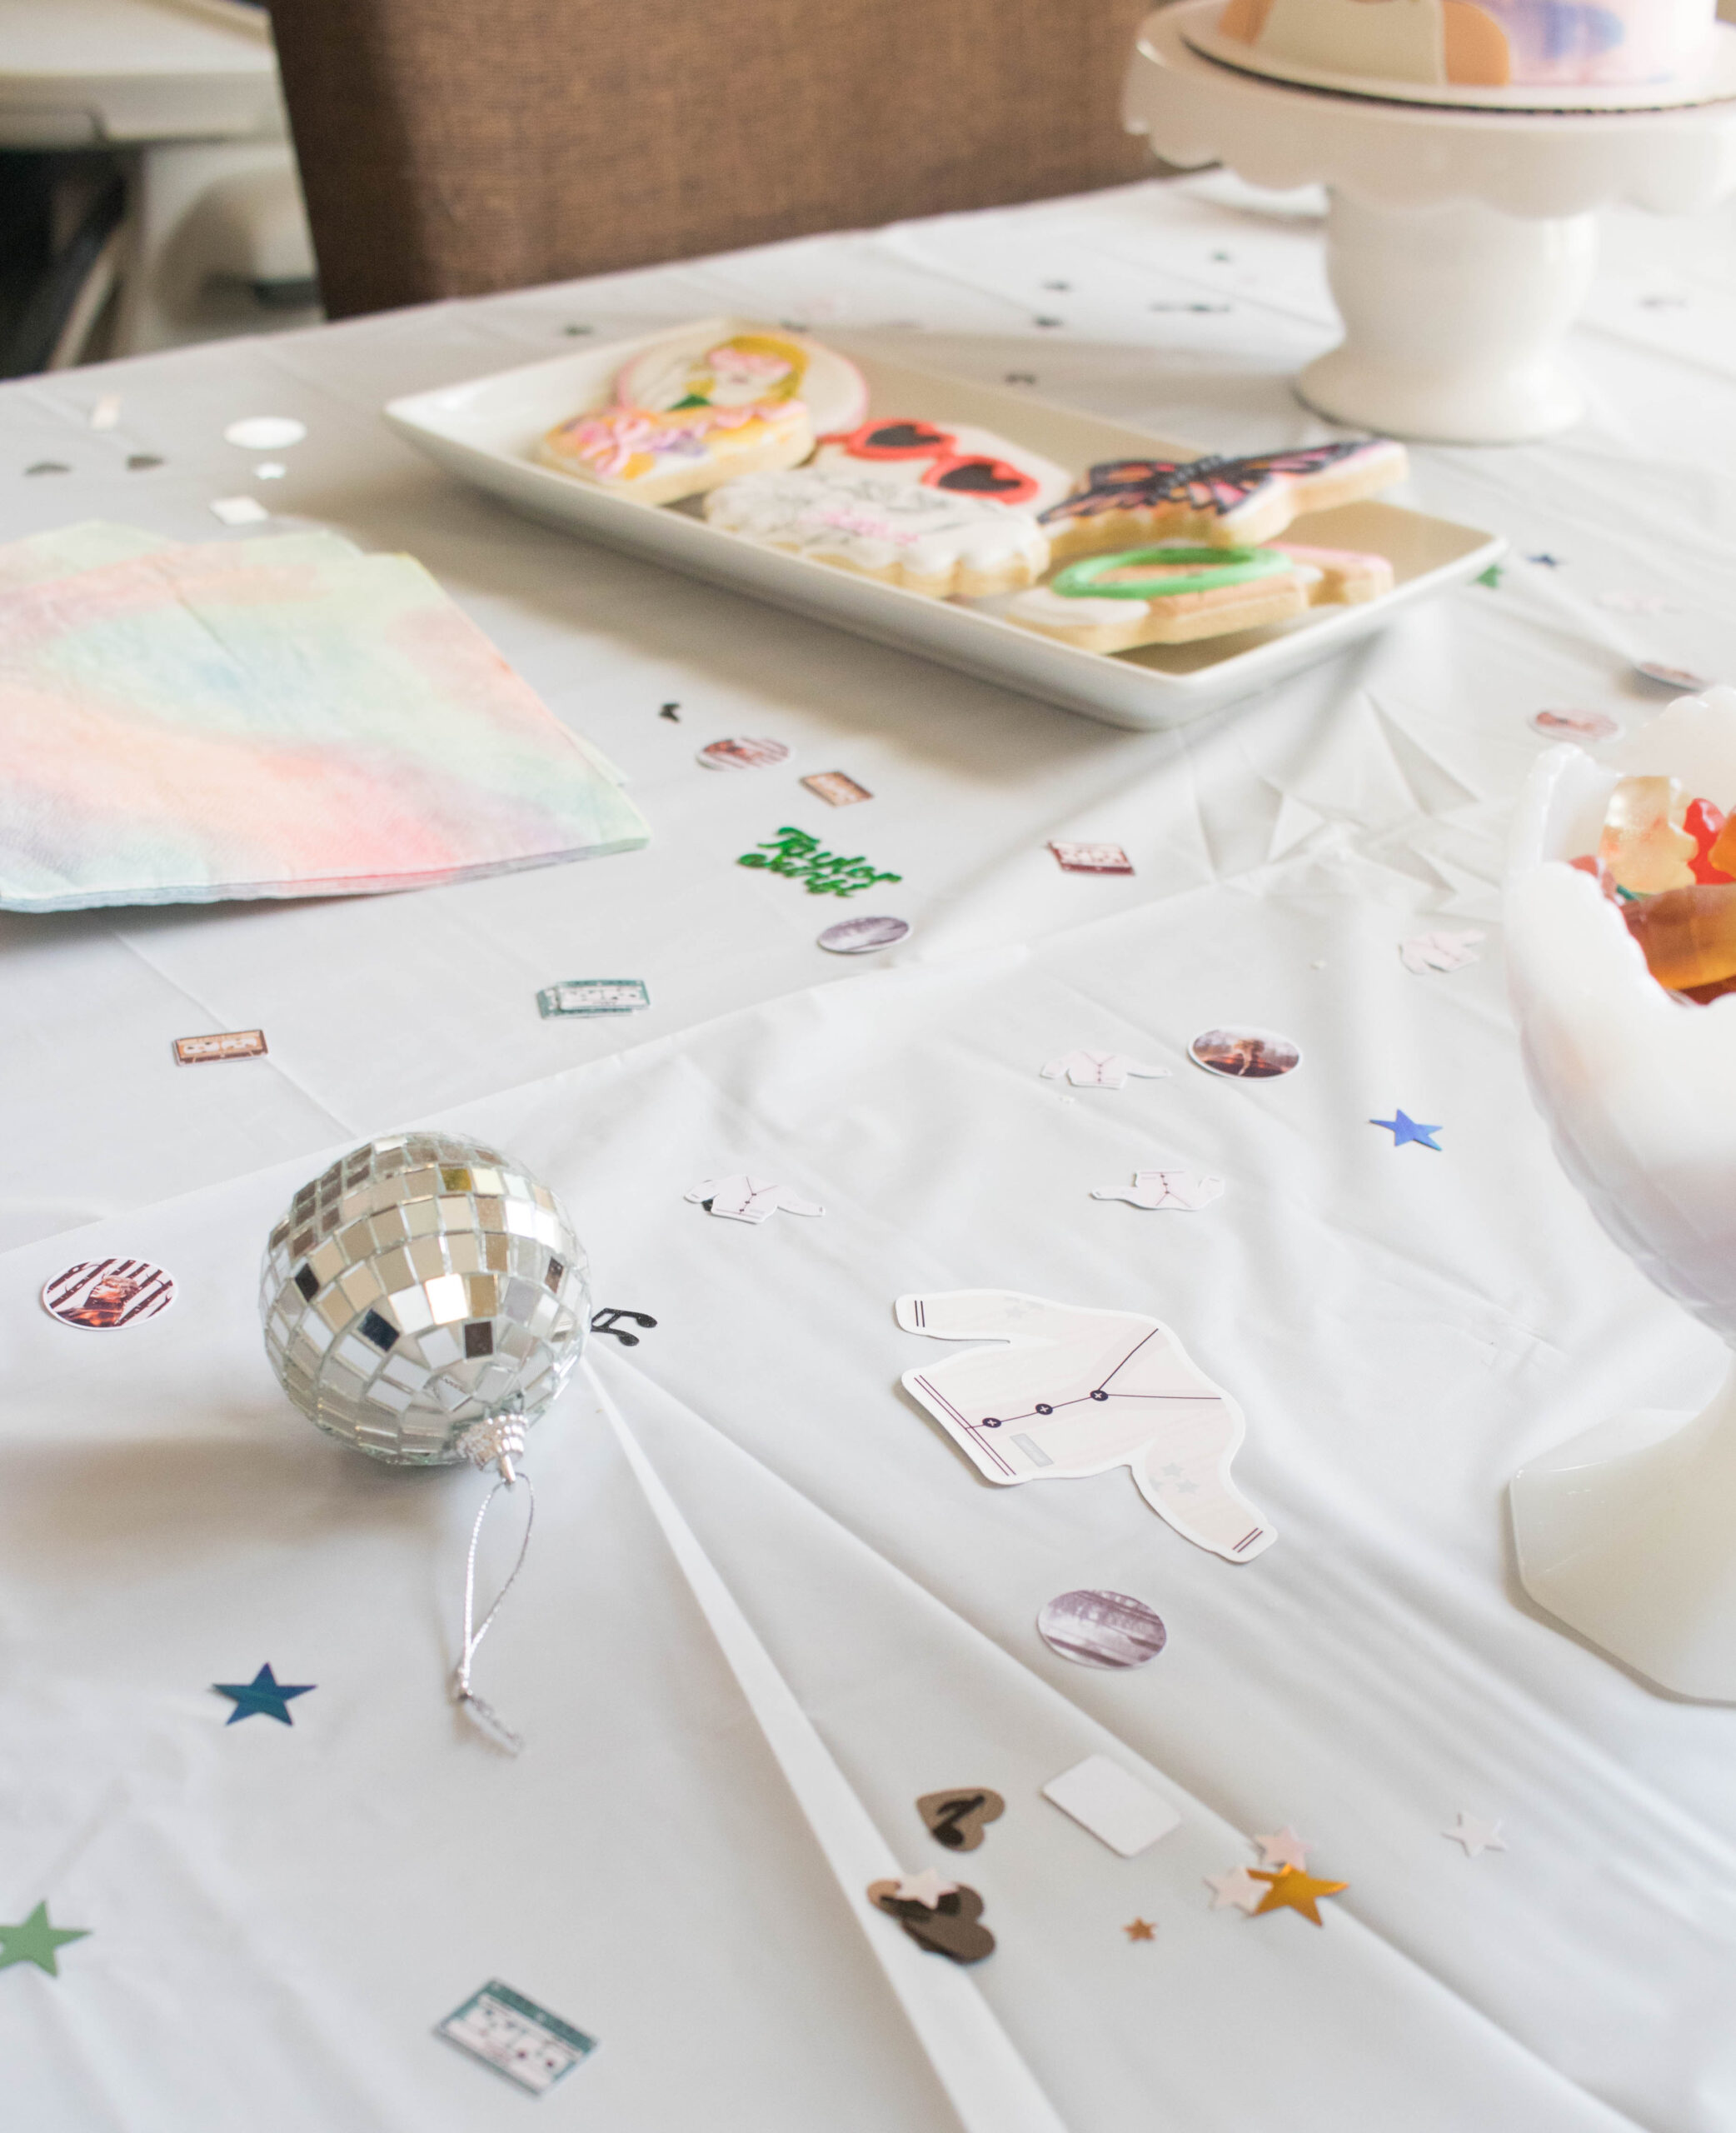 taylor swift confetti for birthday party #taylorswiftbirthday #swiftie #partyideas